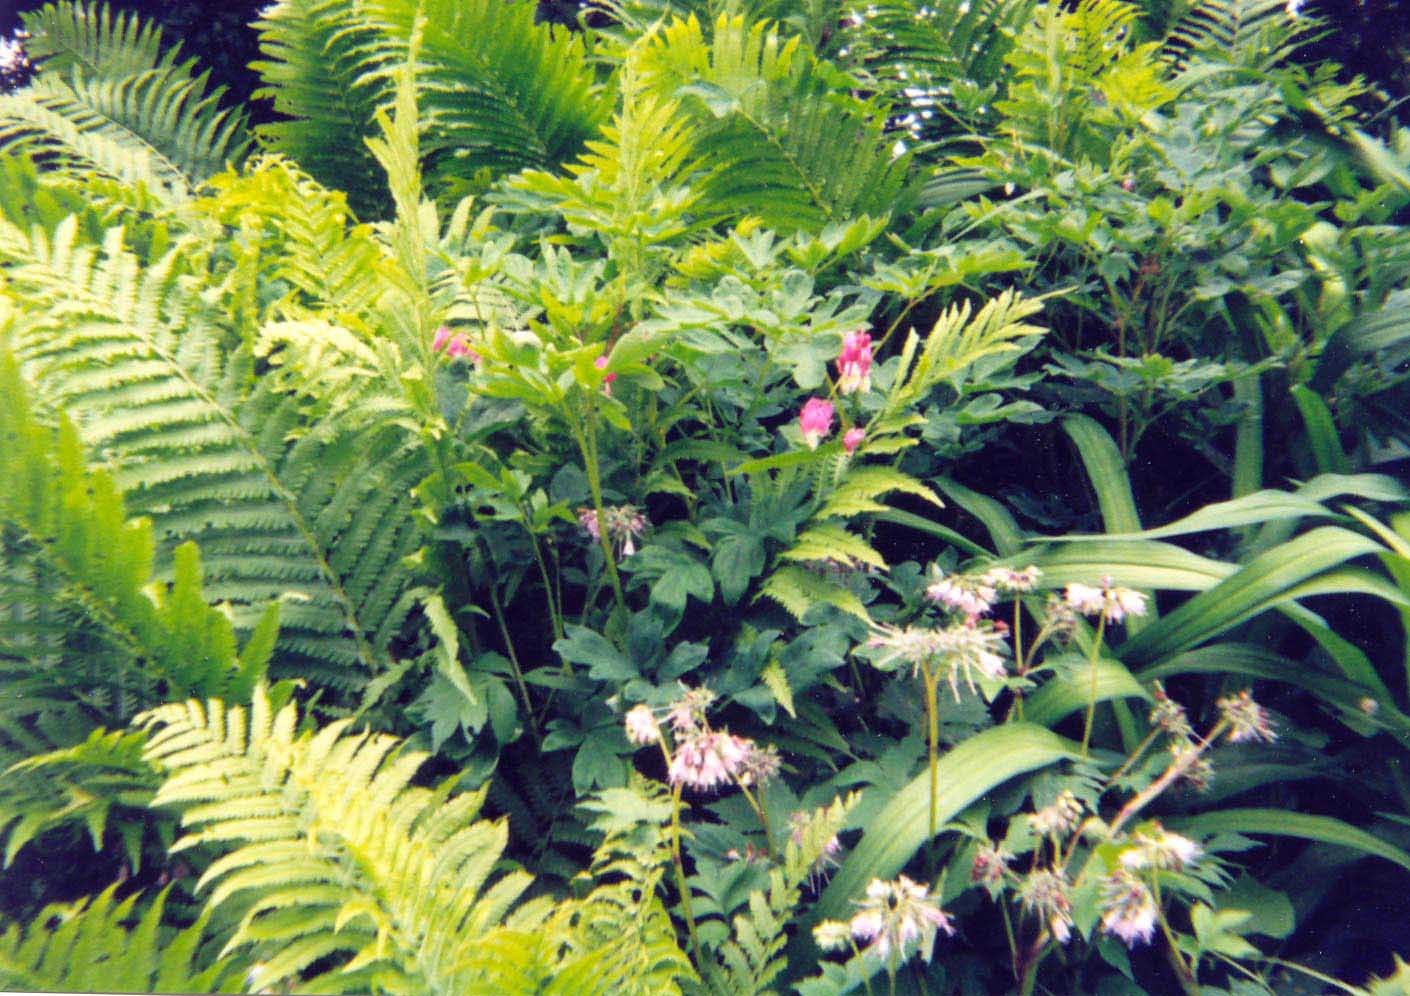 fernsnbleedinghearts2.jpg